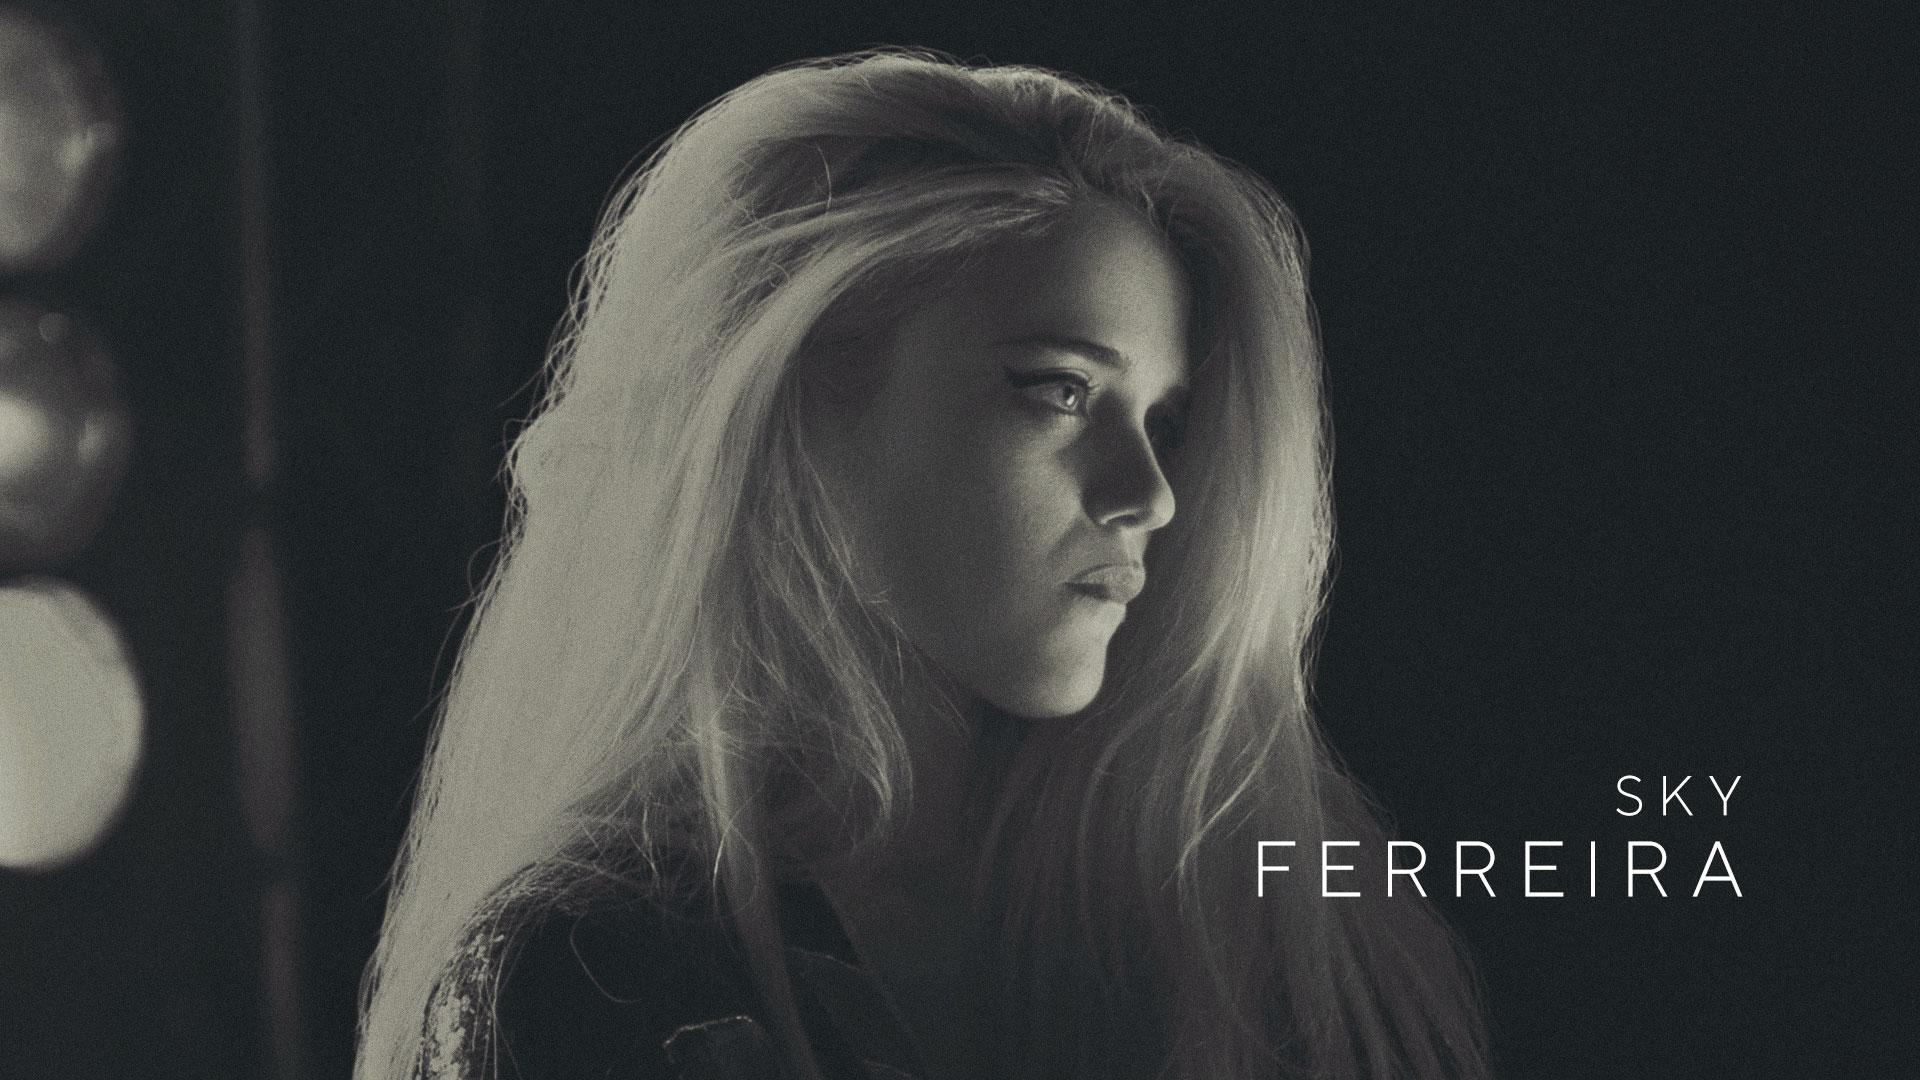 Sky Ferreira as Fiji in